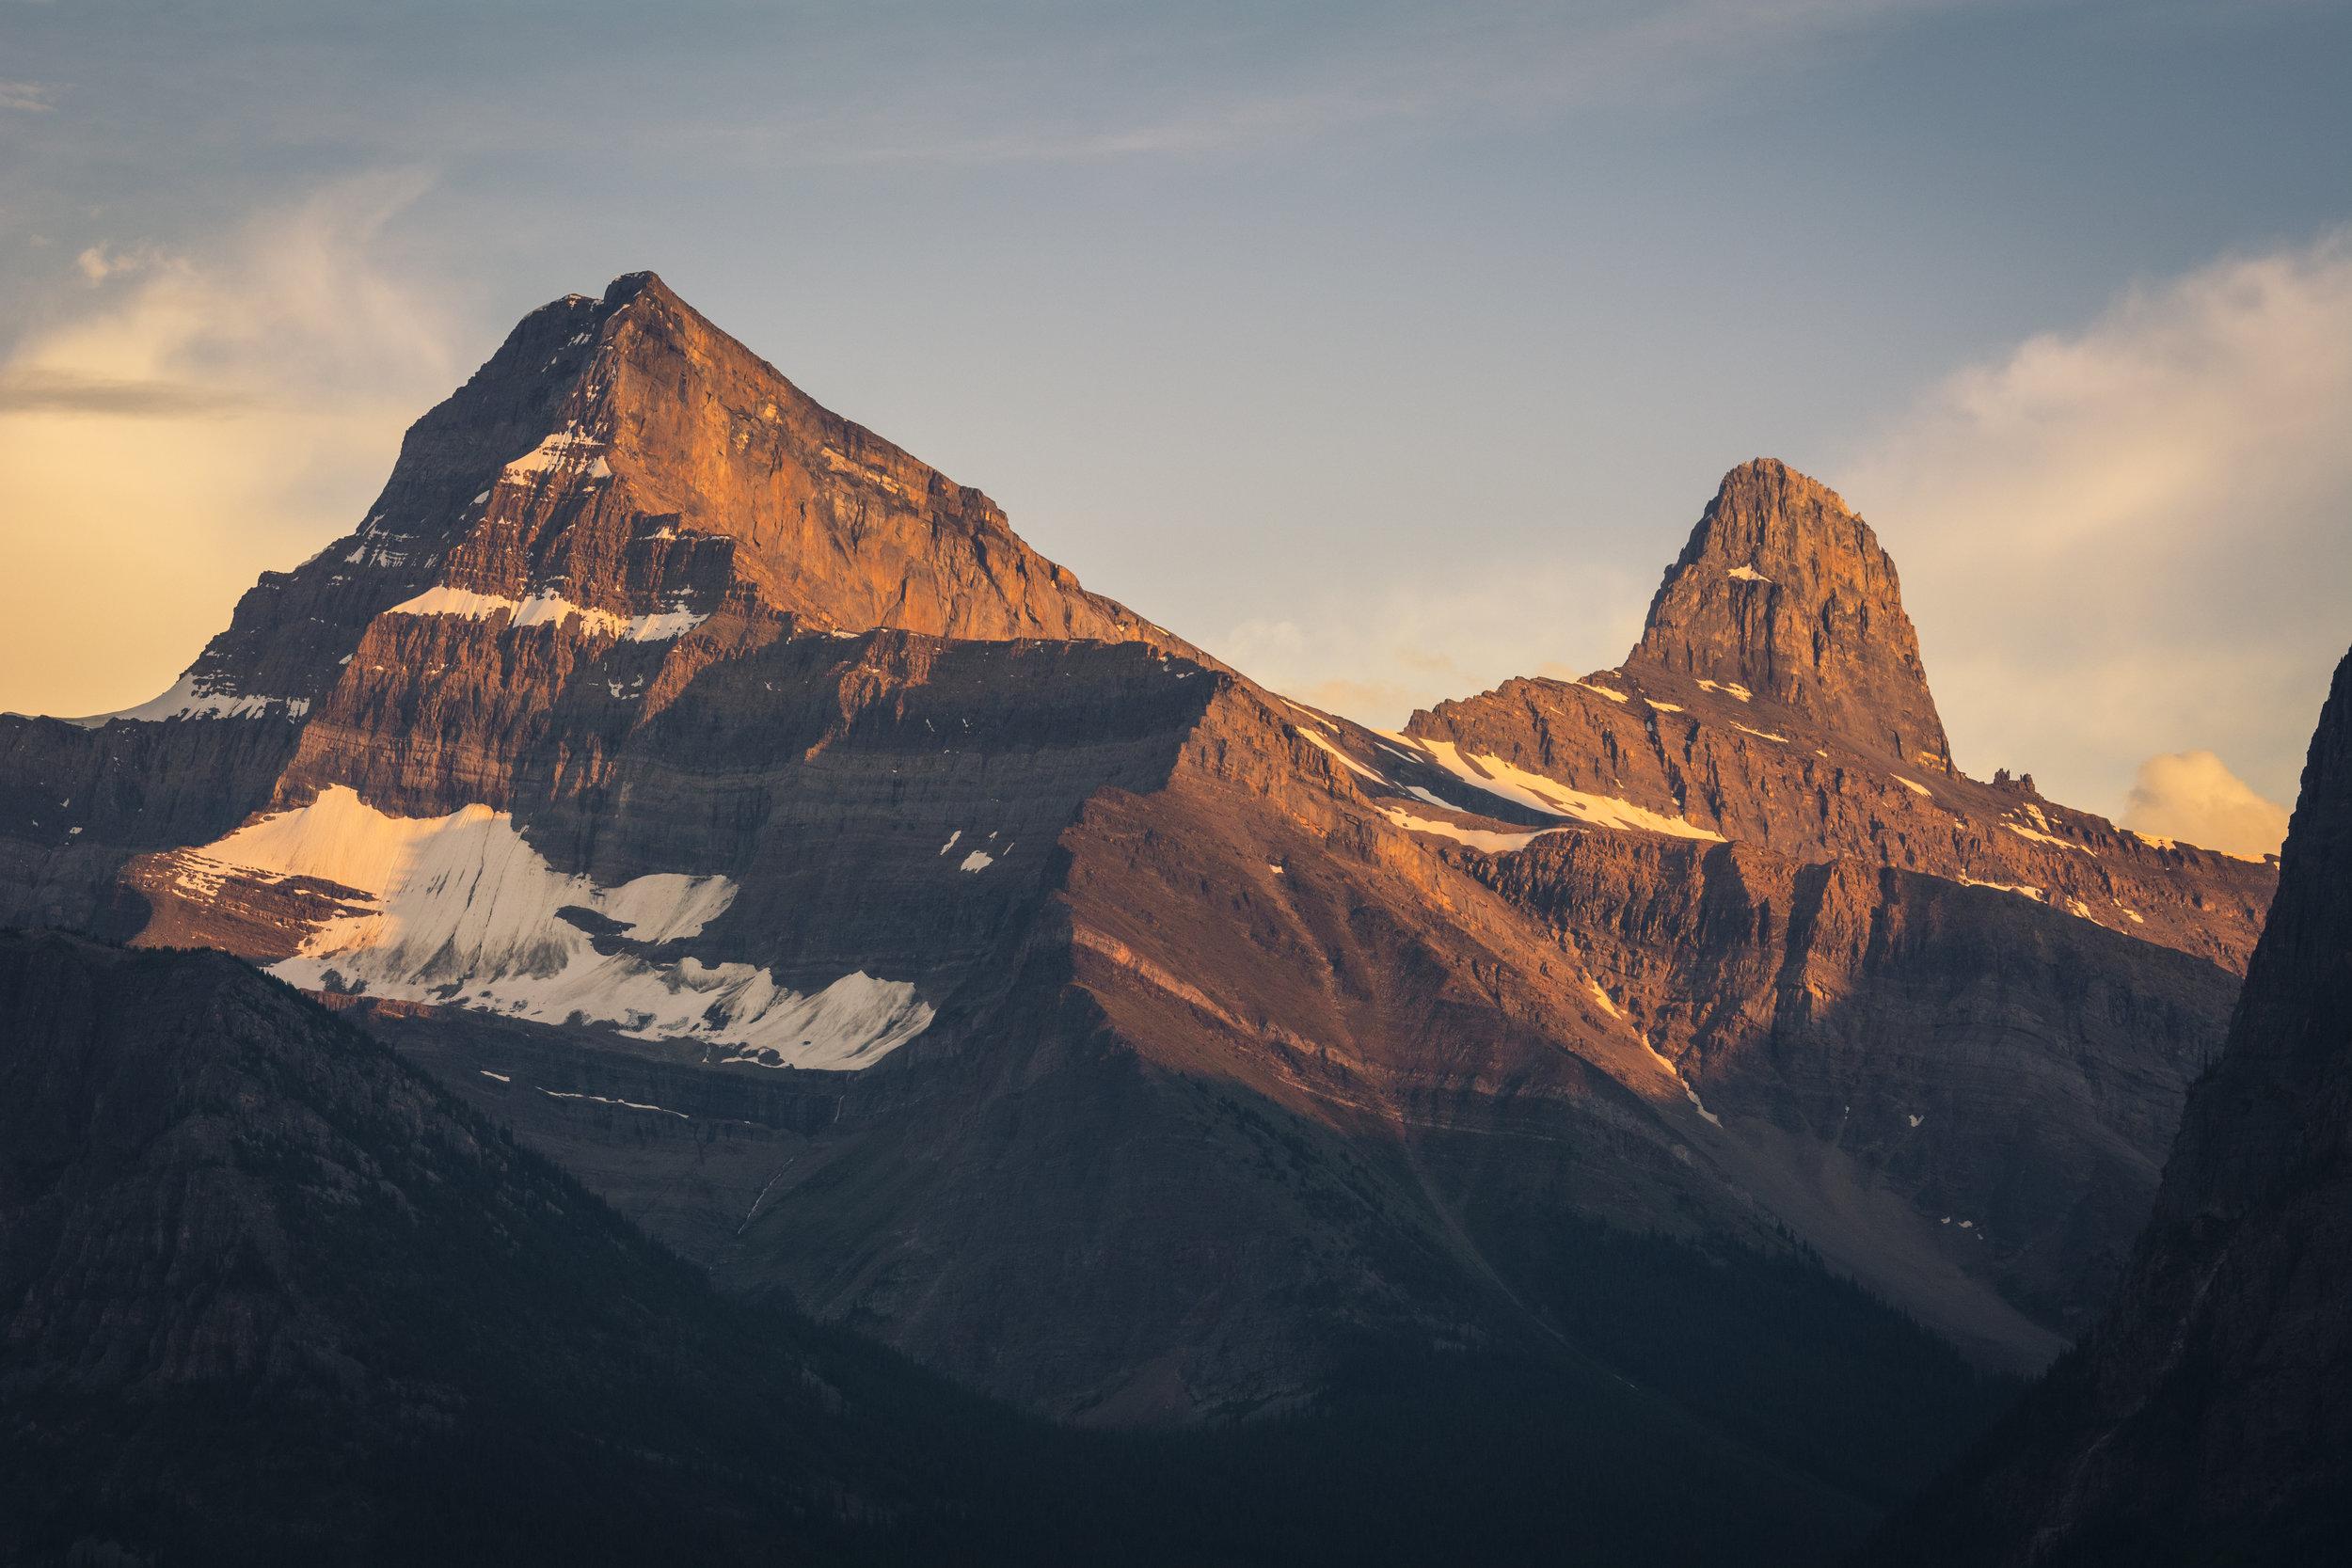 Mount Christie and Brussels Peak, Jasper National Park, Alberta, Canada